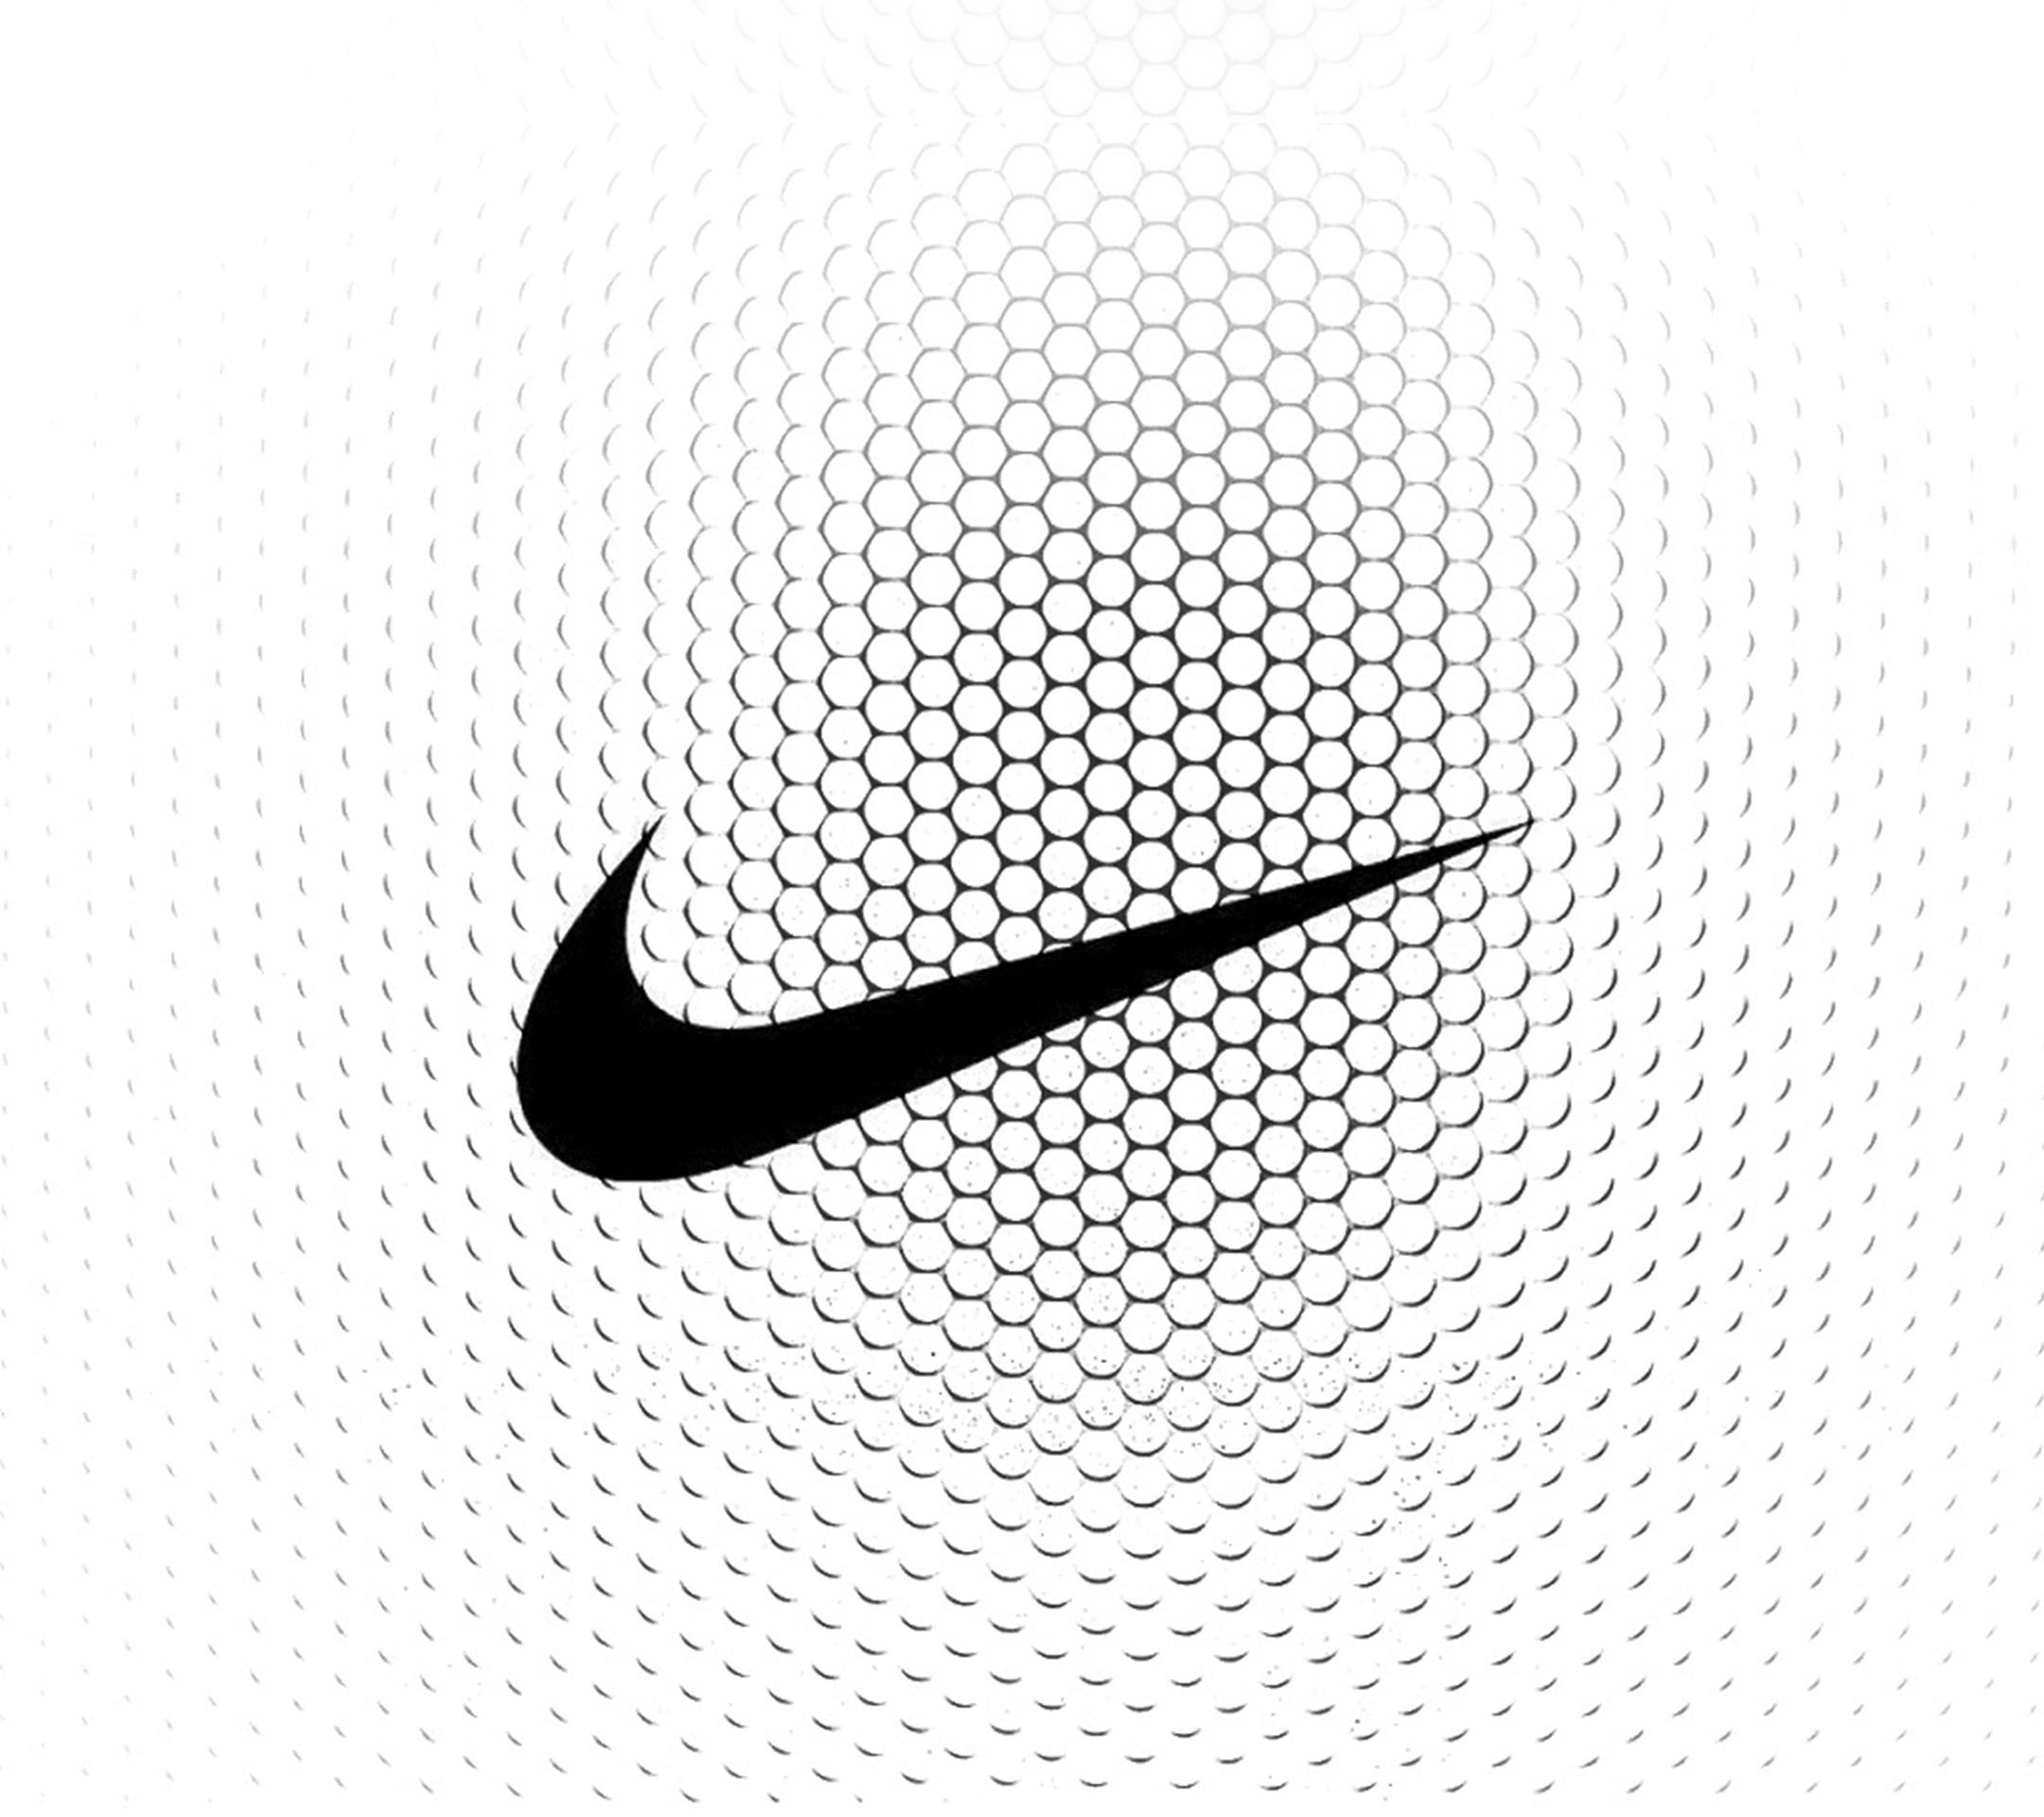 Fonds D écran Nike Nike Air Max Ltd Chaussures Hommes